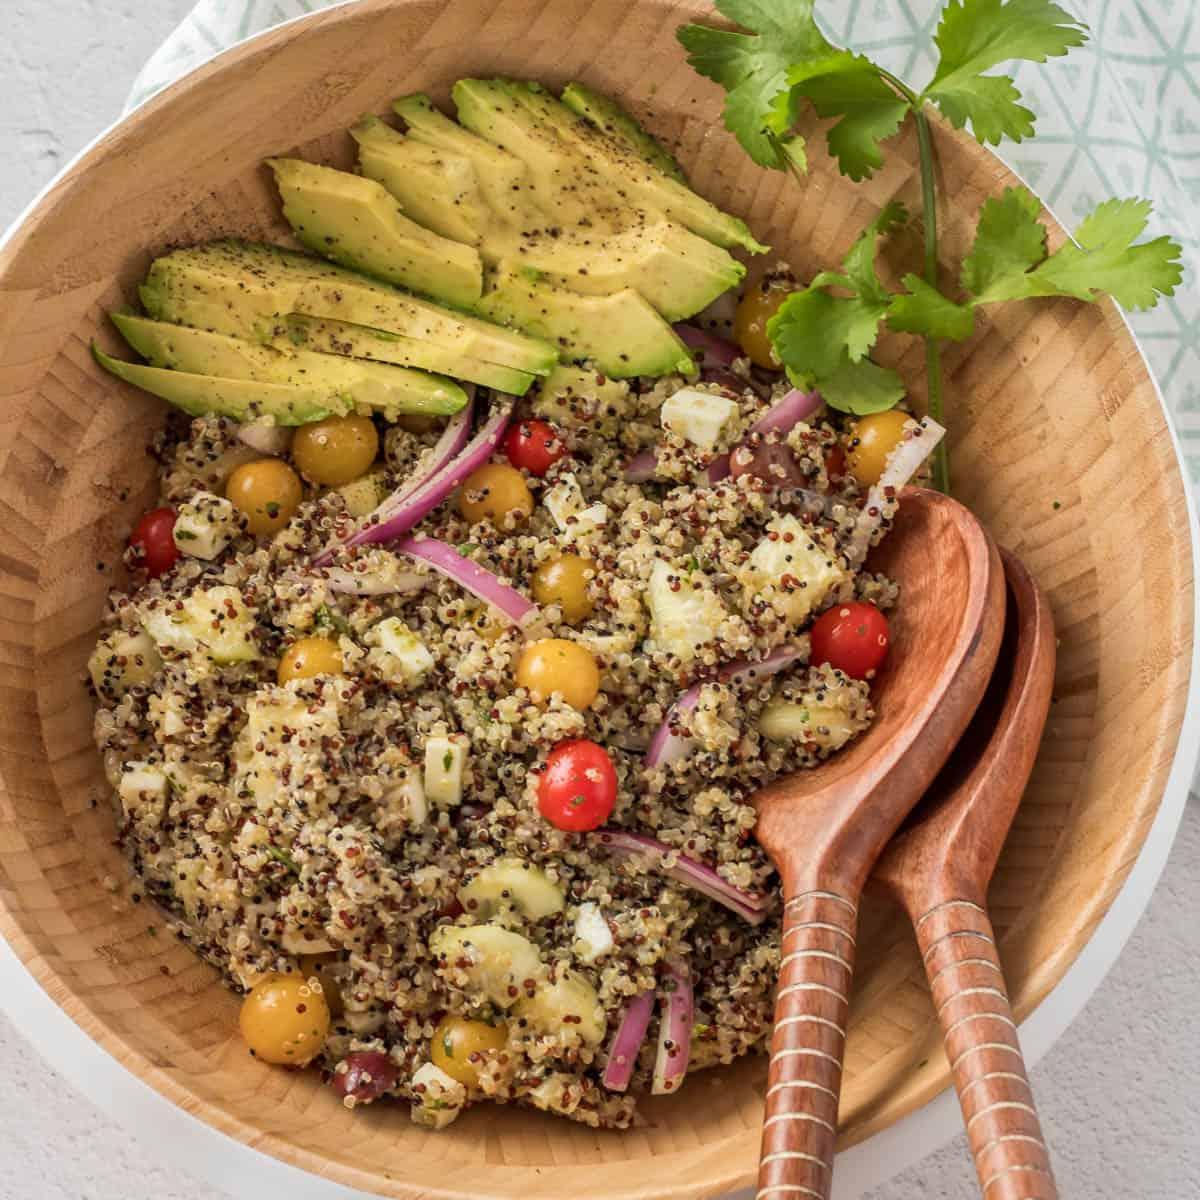 A wood salad bowl with Peruvian quinoa salad, sliced avocados and wood salad utensils.